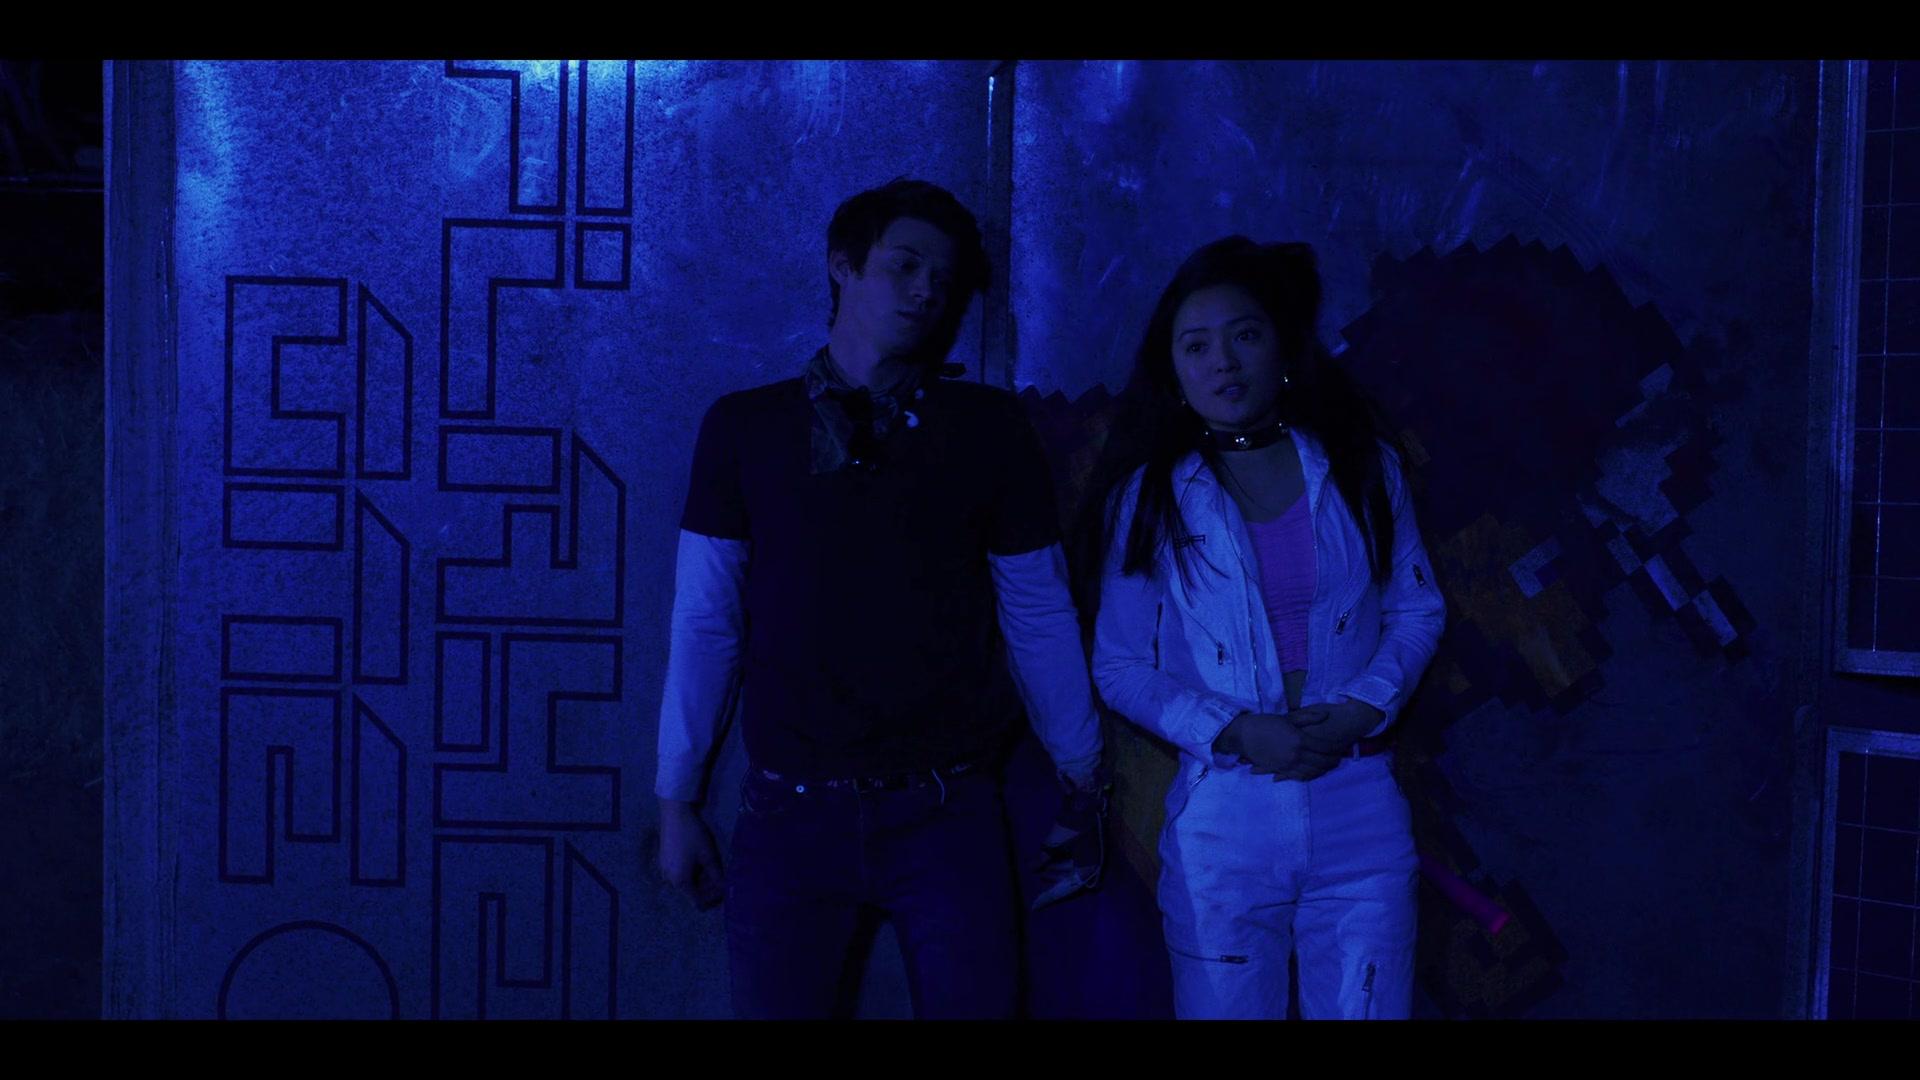 I Am Gia Jacket Worn By Chelsea Zhang As Kj In Daybreak Season 1 Episode 6 5318008 2019 People who liked chelsea zhang's feet, also liked i am gia jacket worn by chelsea zhang